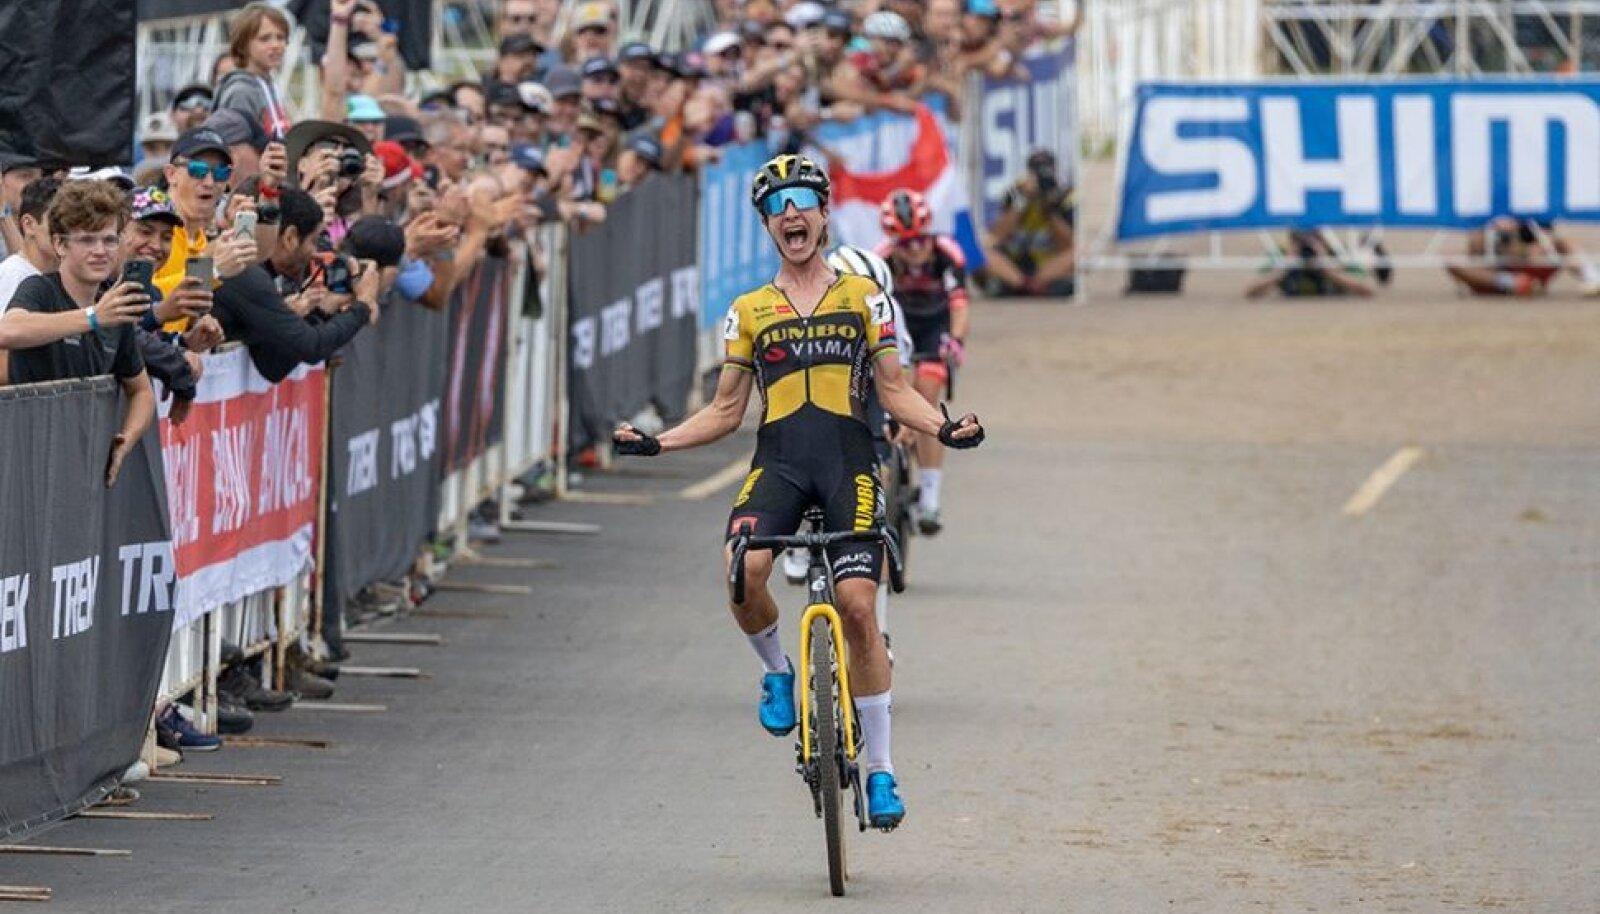 Marianne Vos võitmas hooaja esimest cyclo-crossi MK-etappi